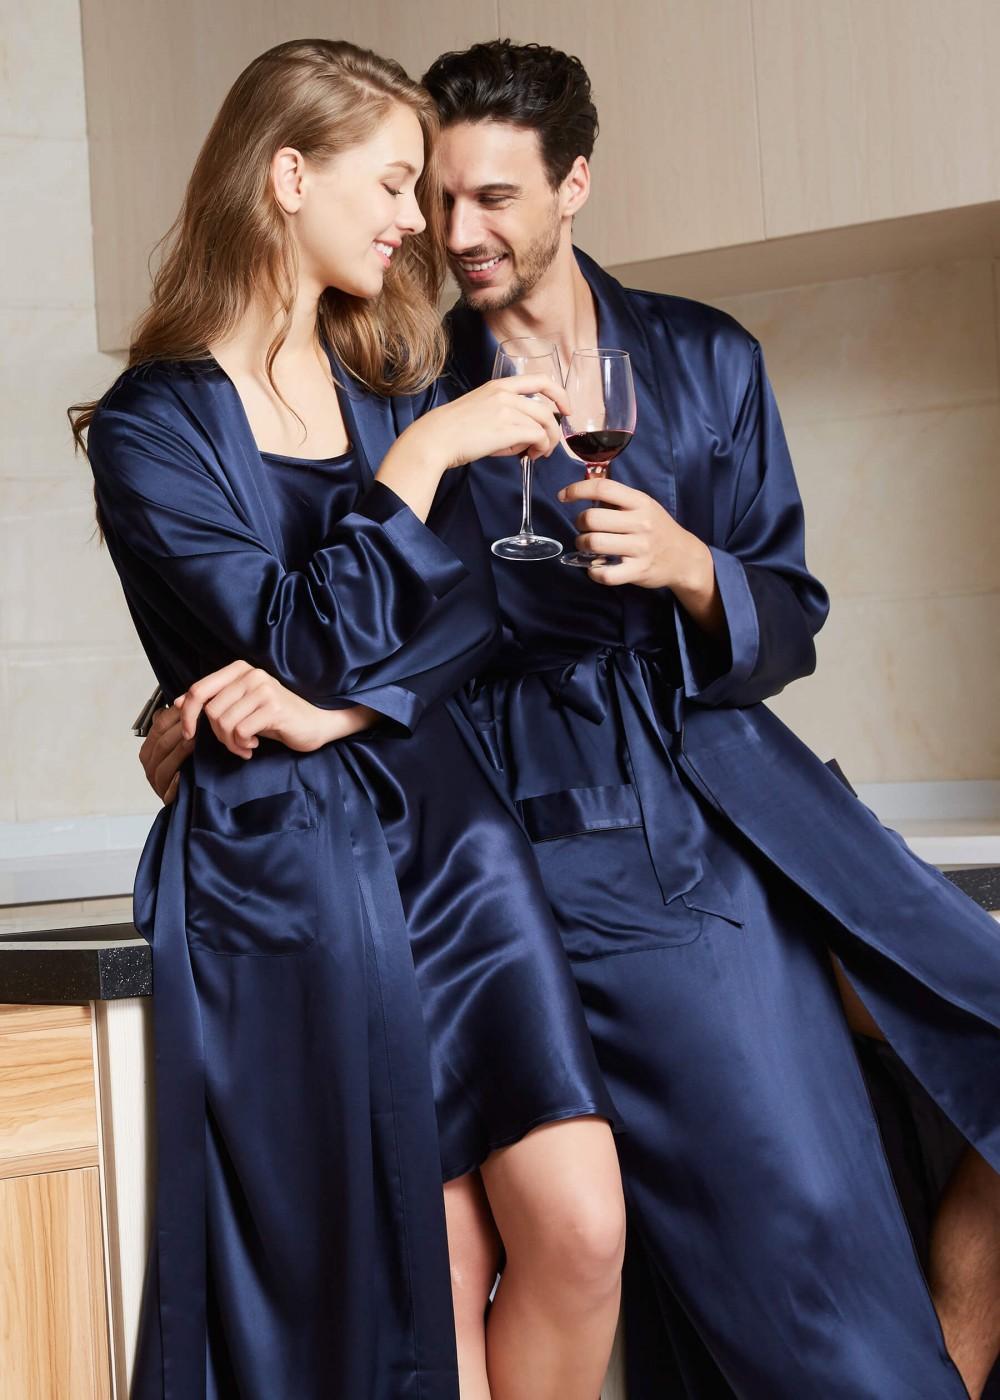 982cd3599a Buy Nighty Dresses & Suits @ Best Price in Pakistan - Daraz.pk